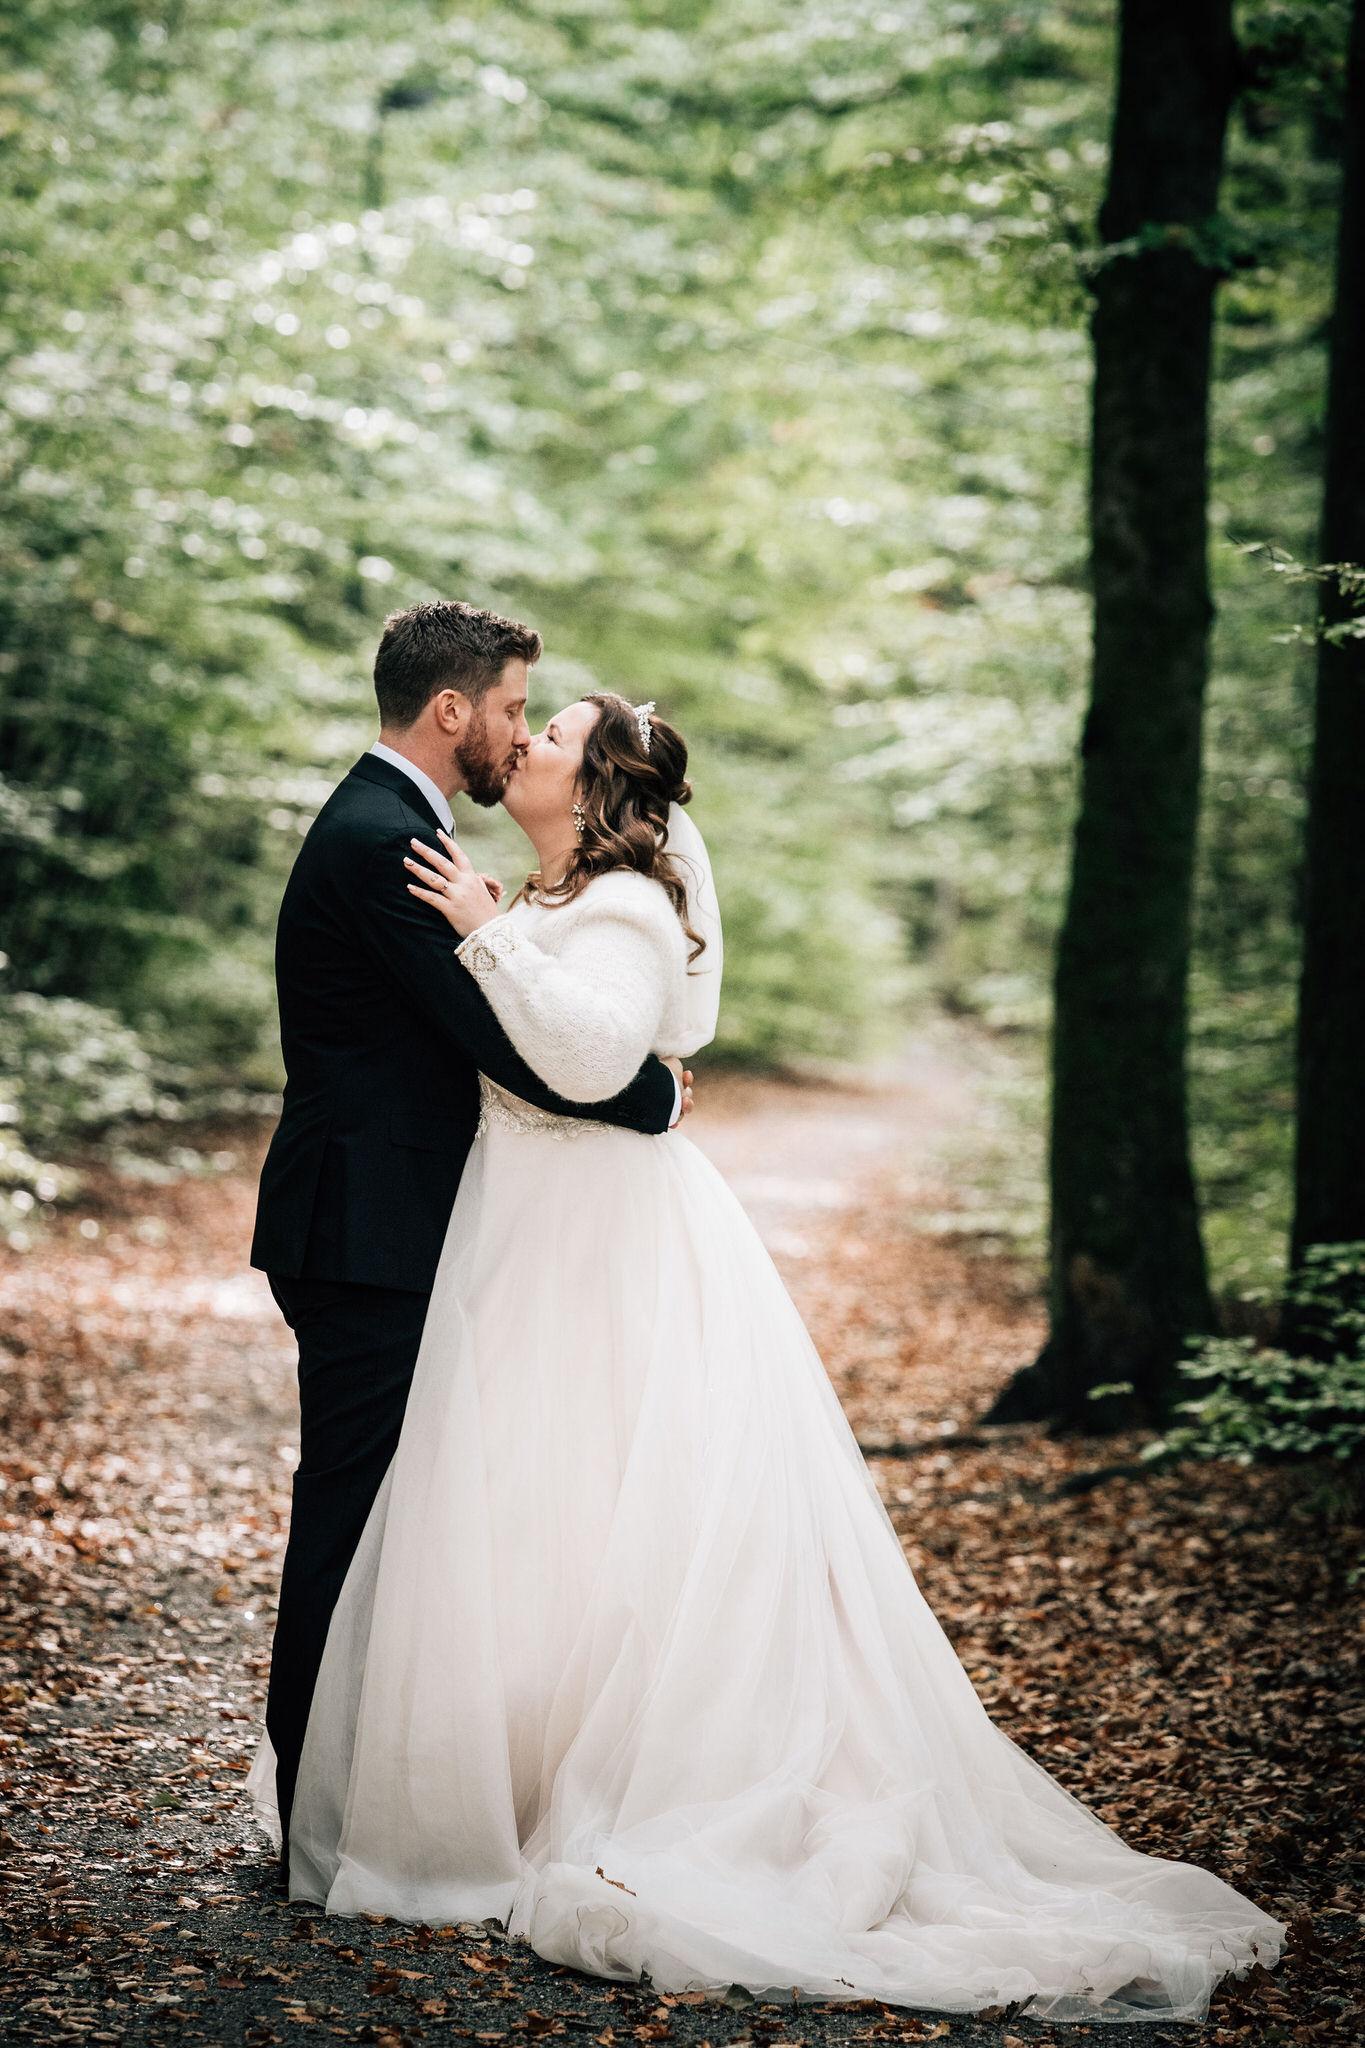 _N857834_fotografering_larvik_bryllup_aspargesgarden_.jpg